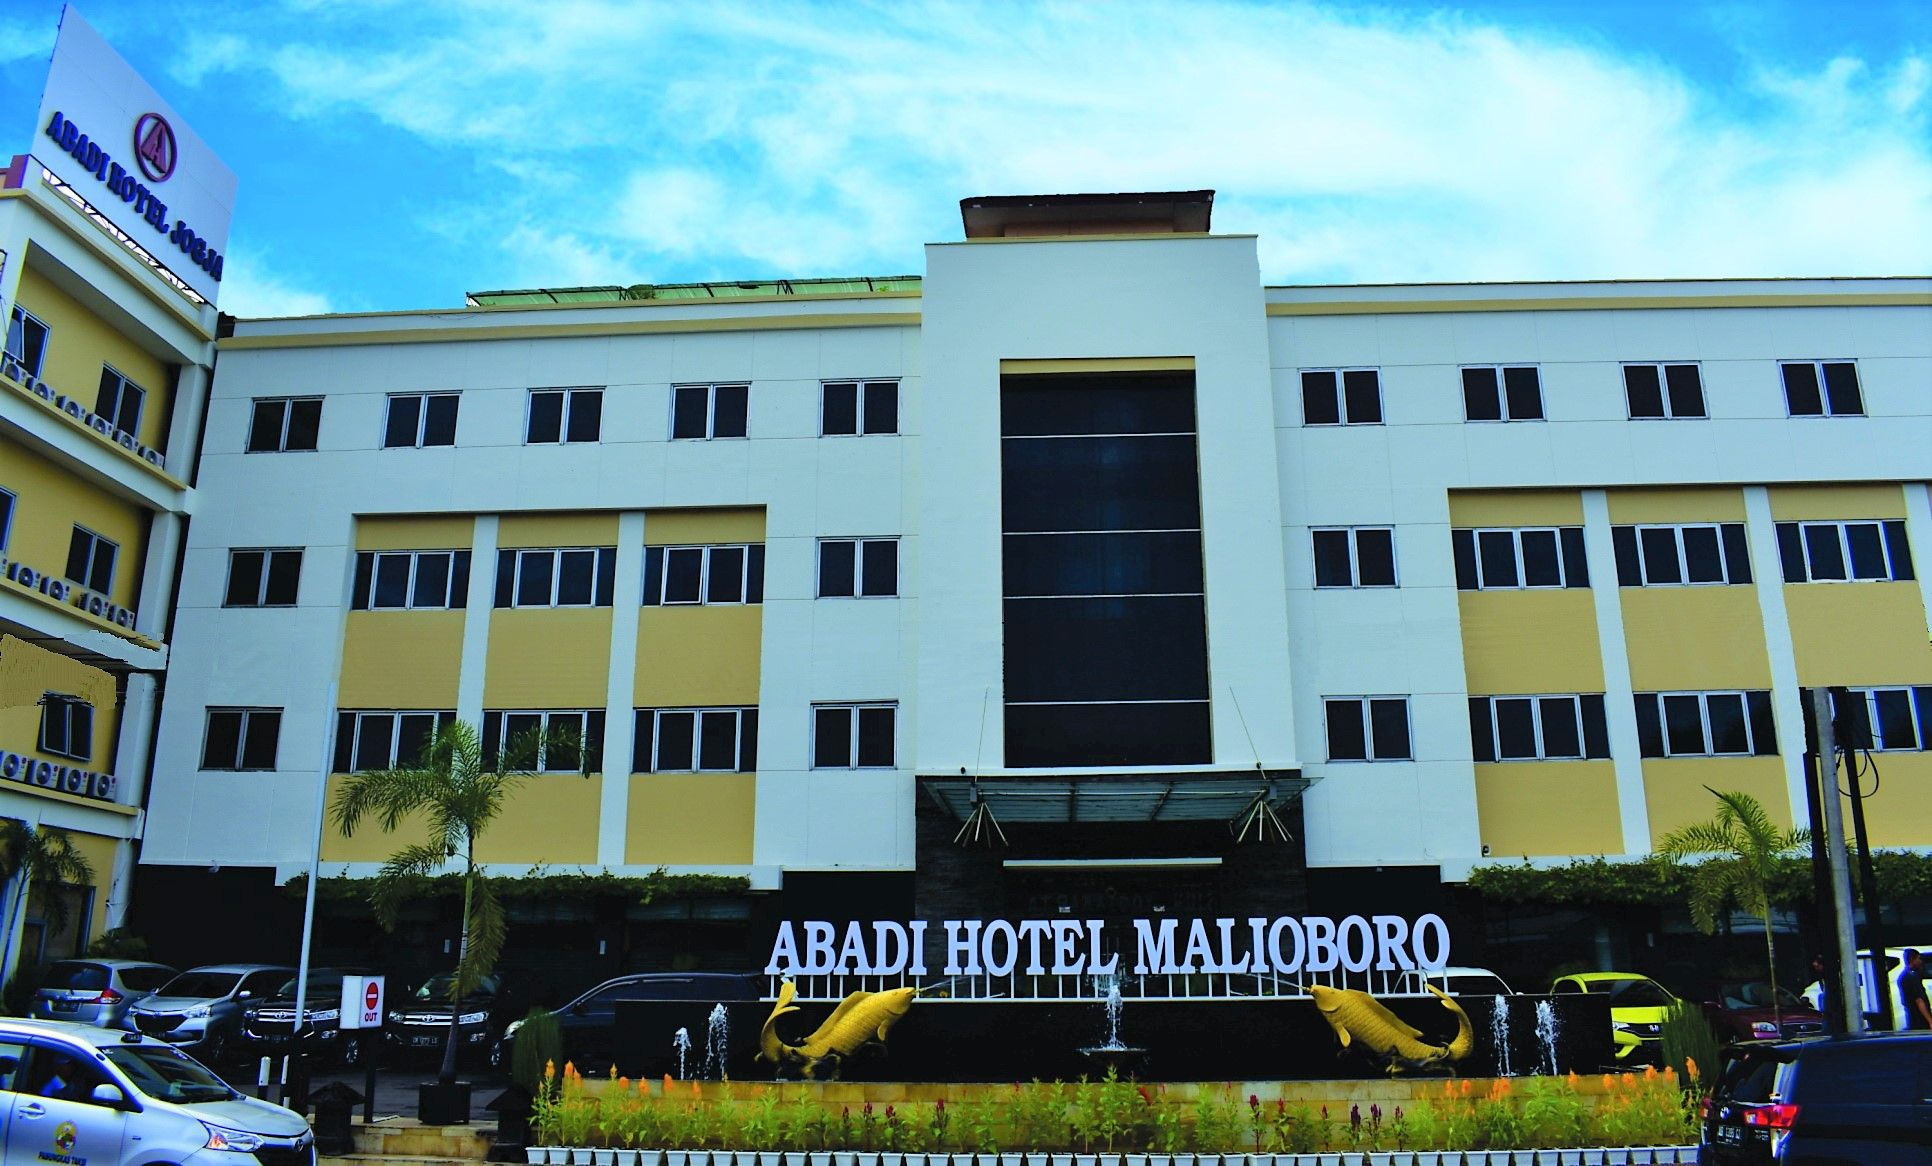 Abadi Hotel Malioboro Yogyakarta by Tritama Hospitality, Yogyakarta